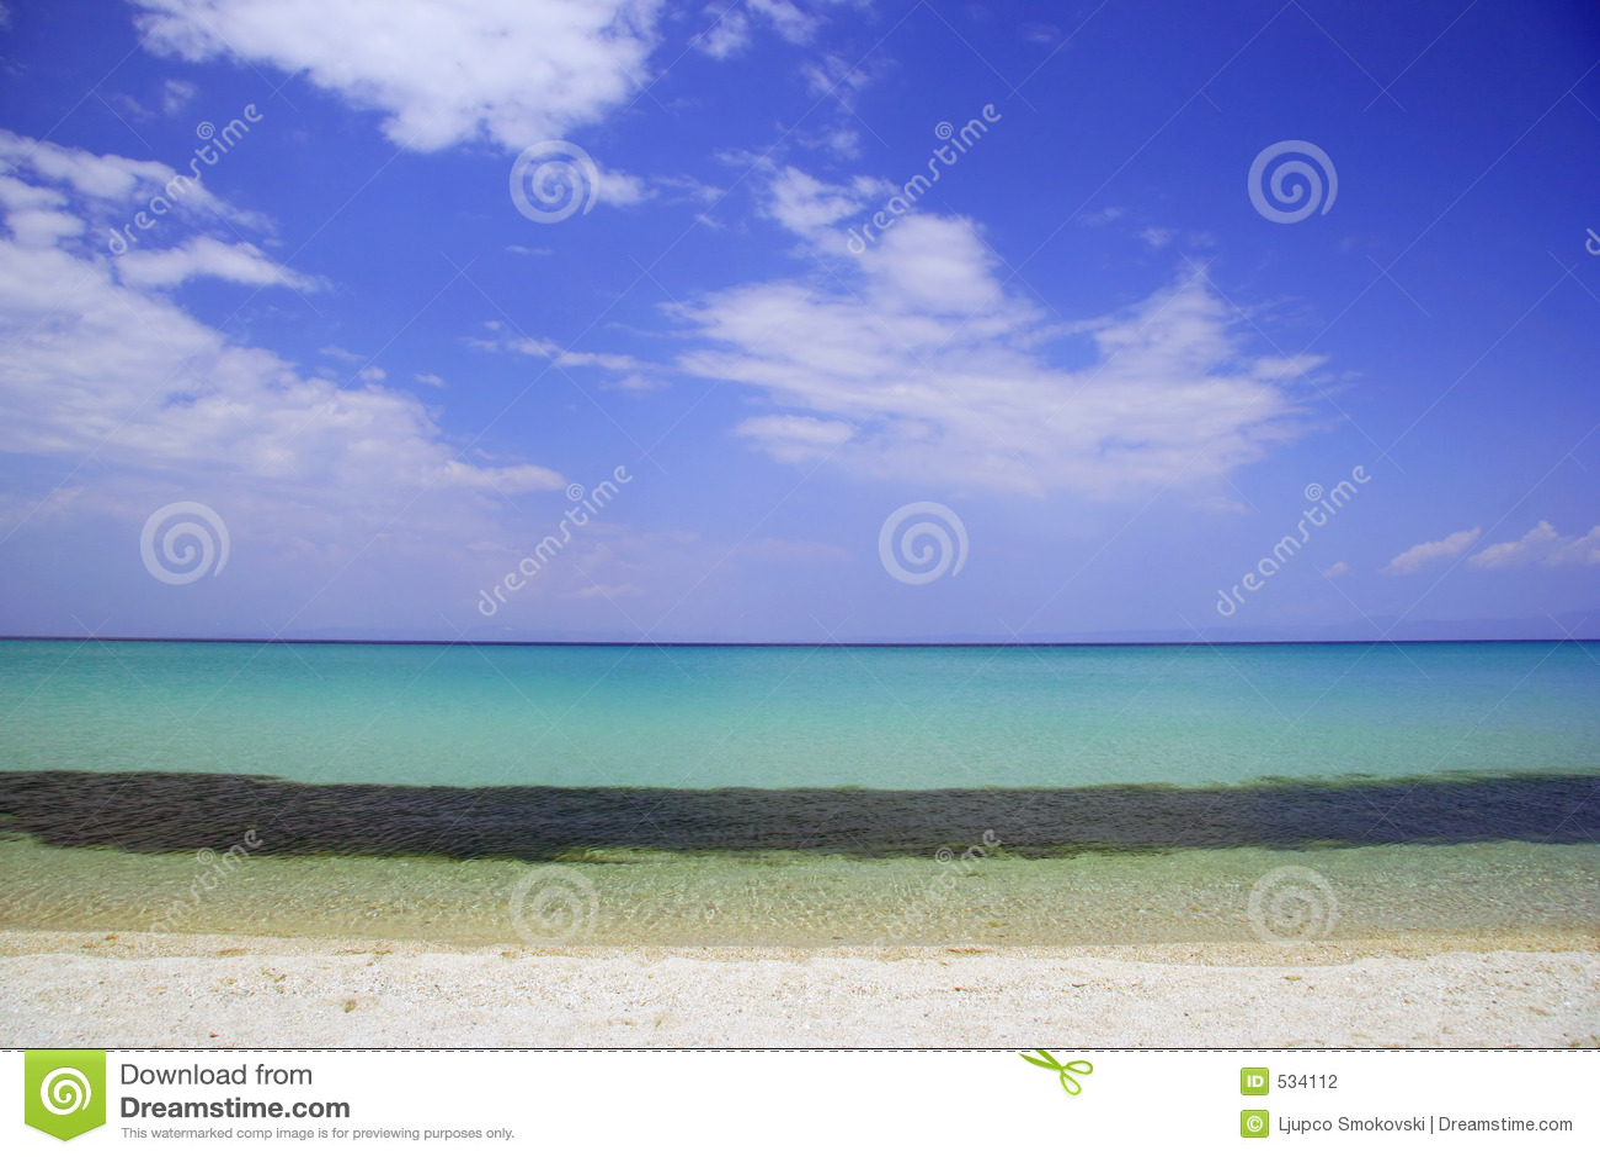 Download 海滩美丽的希腊 库存照片. 图片 包括有 早晨, 小卵石, 海岸, beautifuler, 结算, 天堂, 火箭筒 - 534112